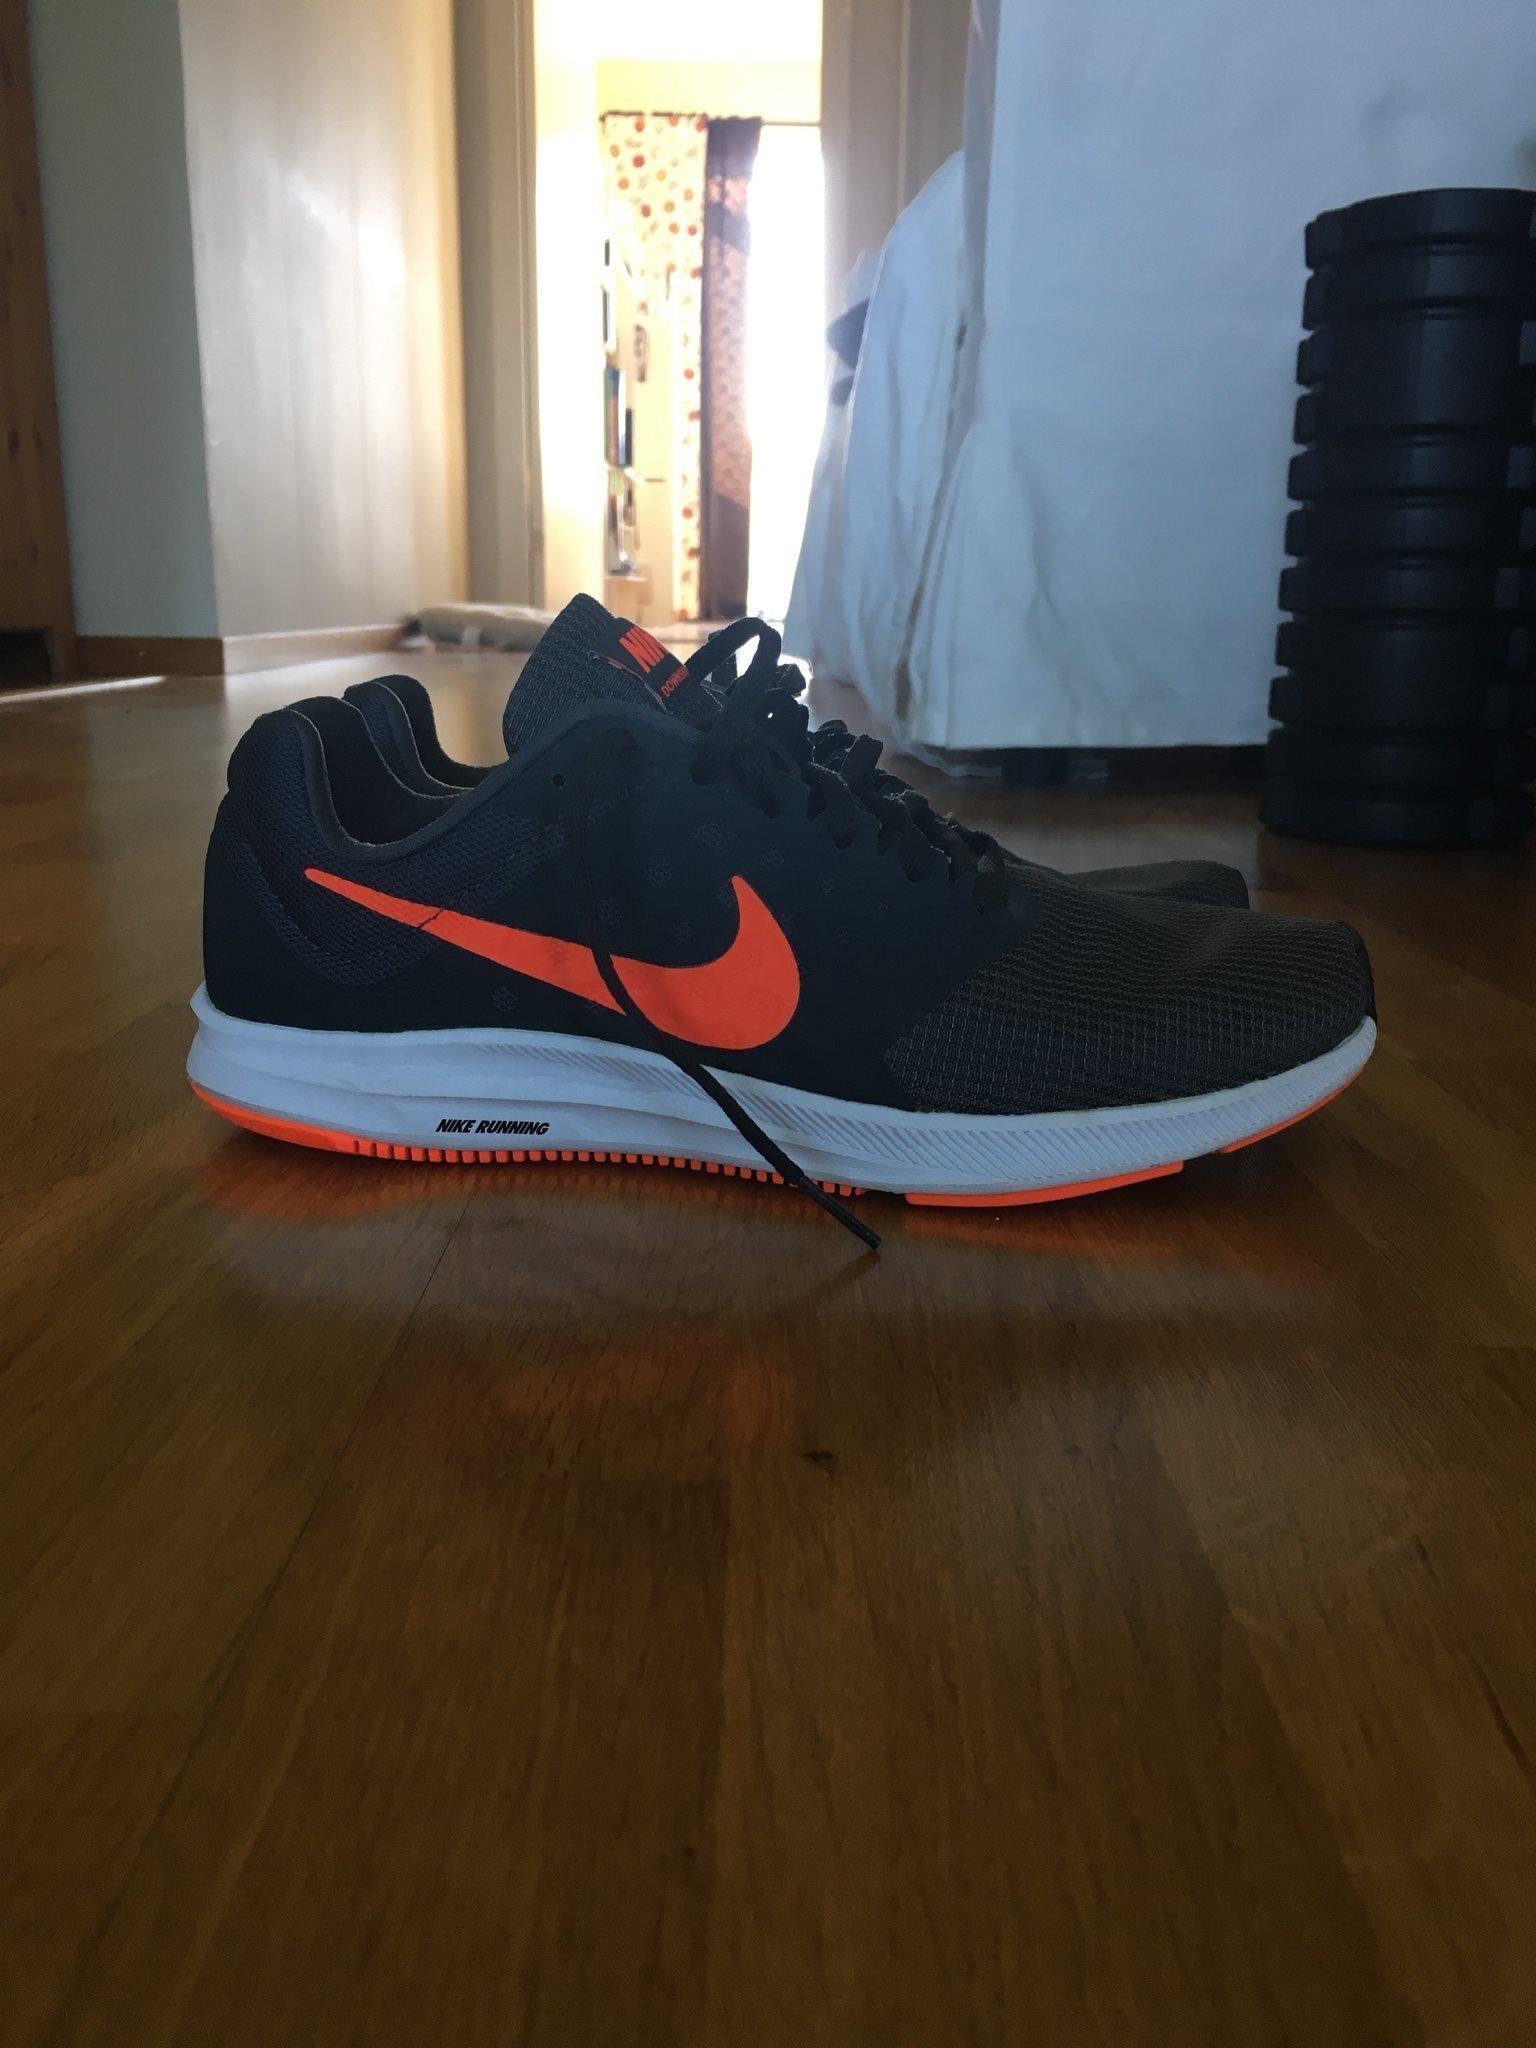 uk availability f35b6 6e215 Running Running 321028577 Skor Skor Nike 42 Storlek PBxaqWdq